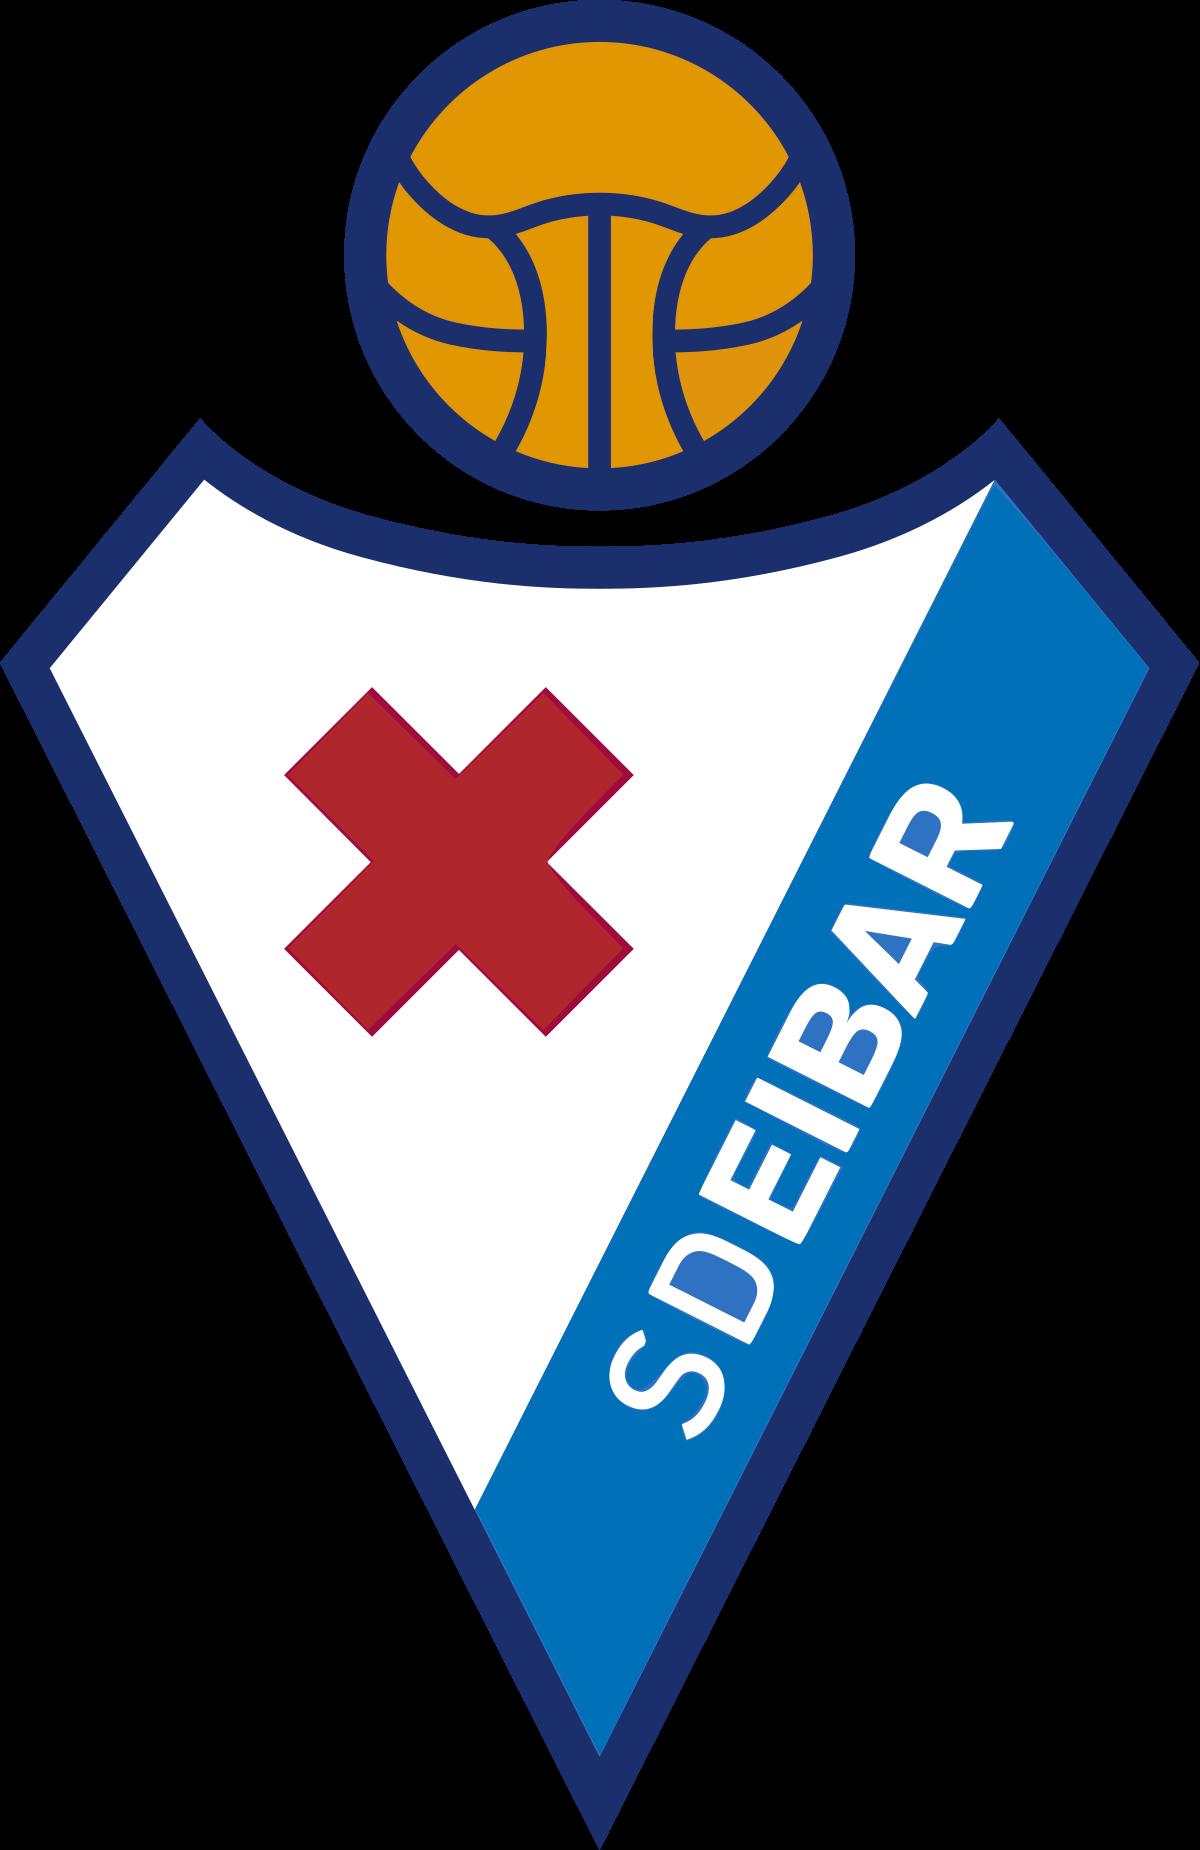 download hd eibar logo la liga sports logo sd team logo football sd eibar logo transparent png image nicepng com download hd eibar logo la liga sports